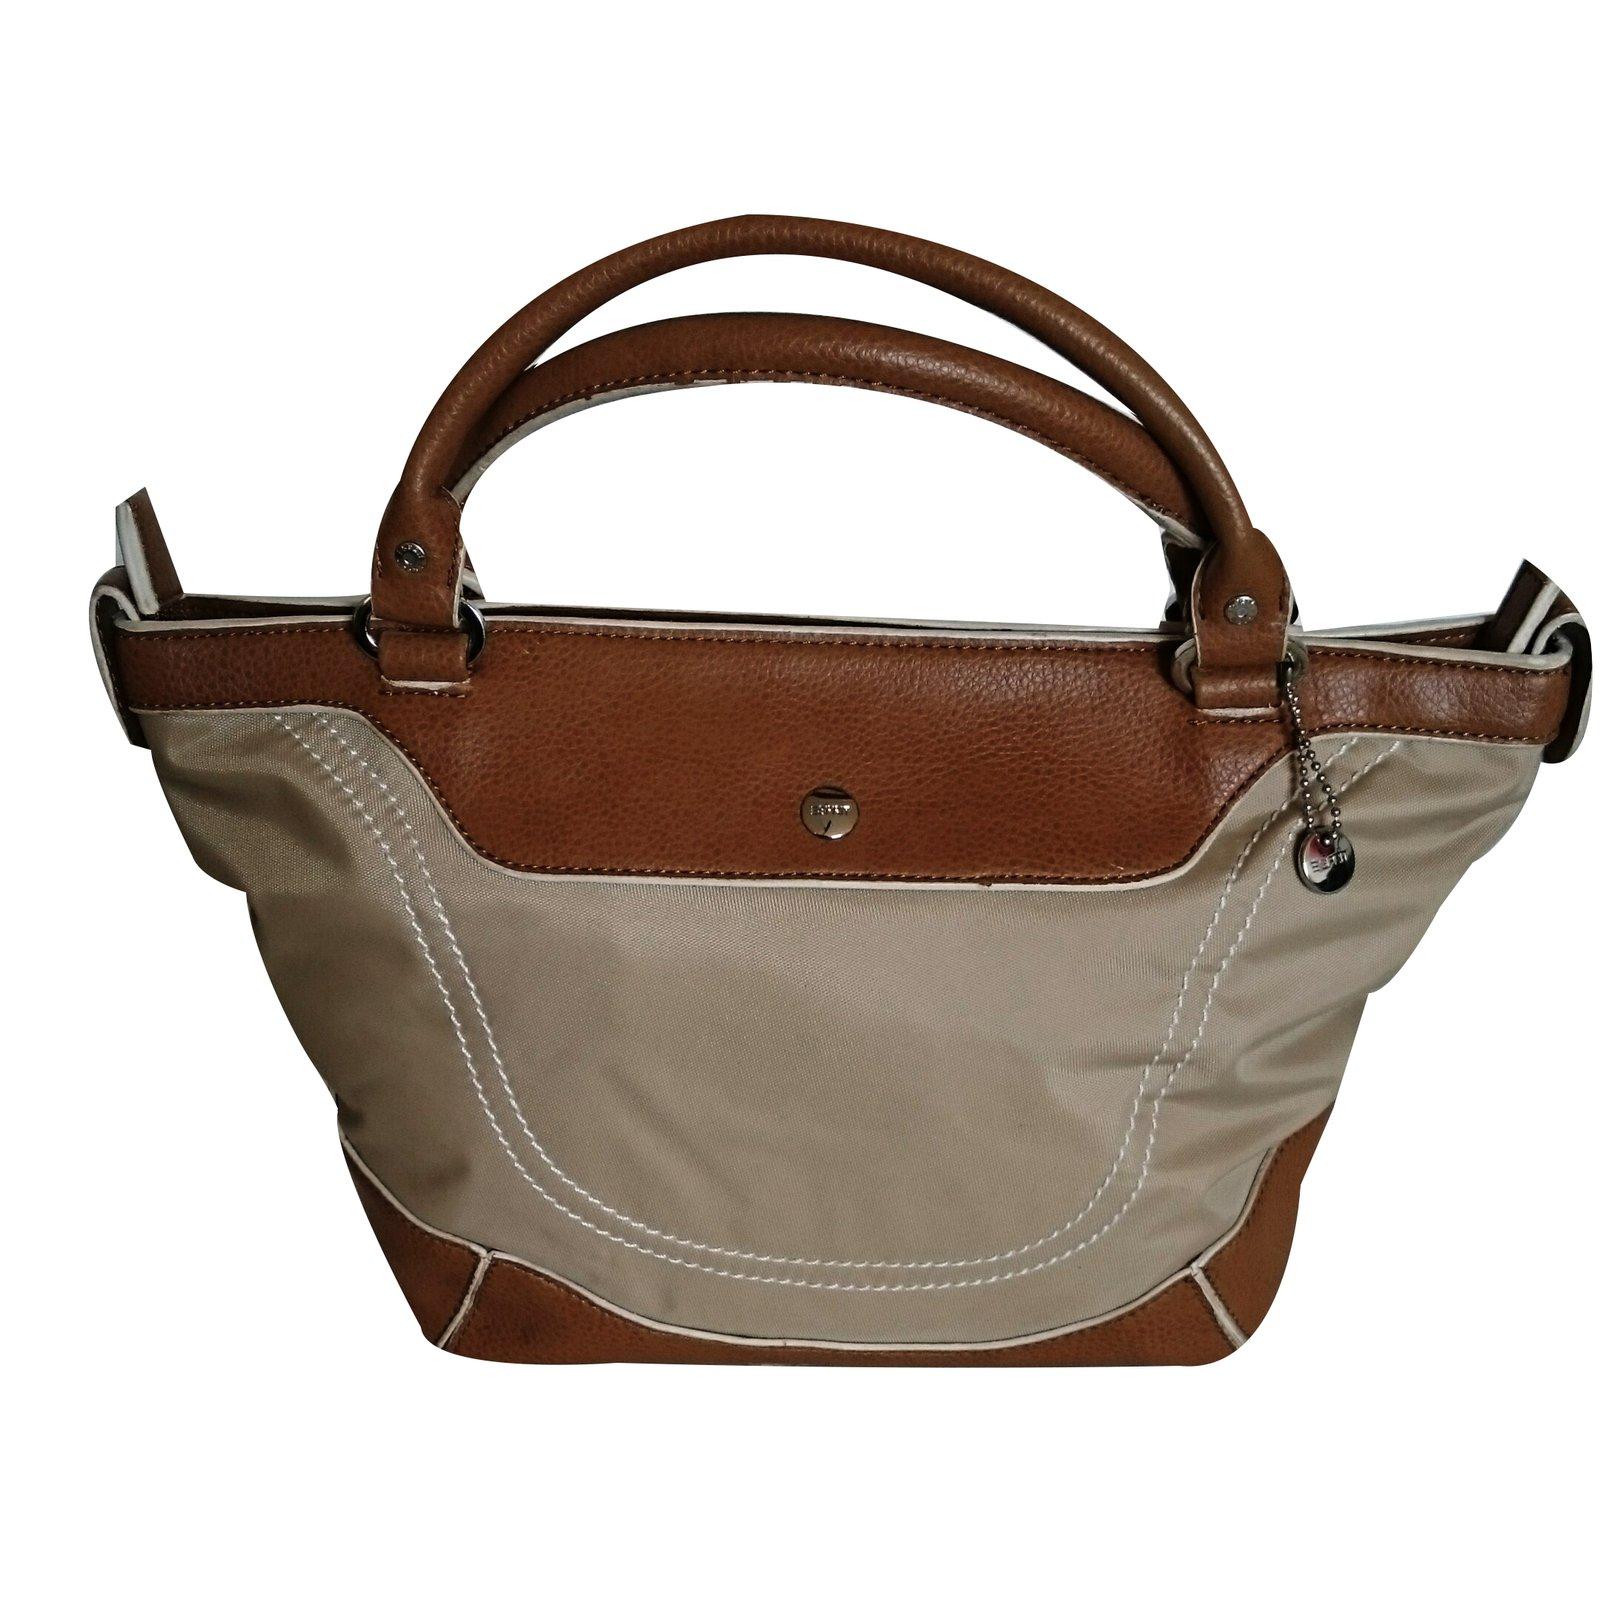 Autre Marque Esprit Handbag Handbags Leather Cloth Beige Caramel Ref 37794